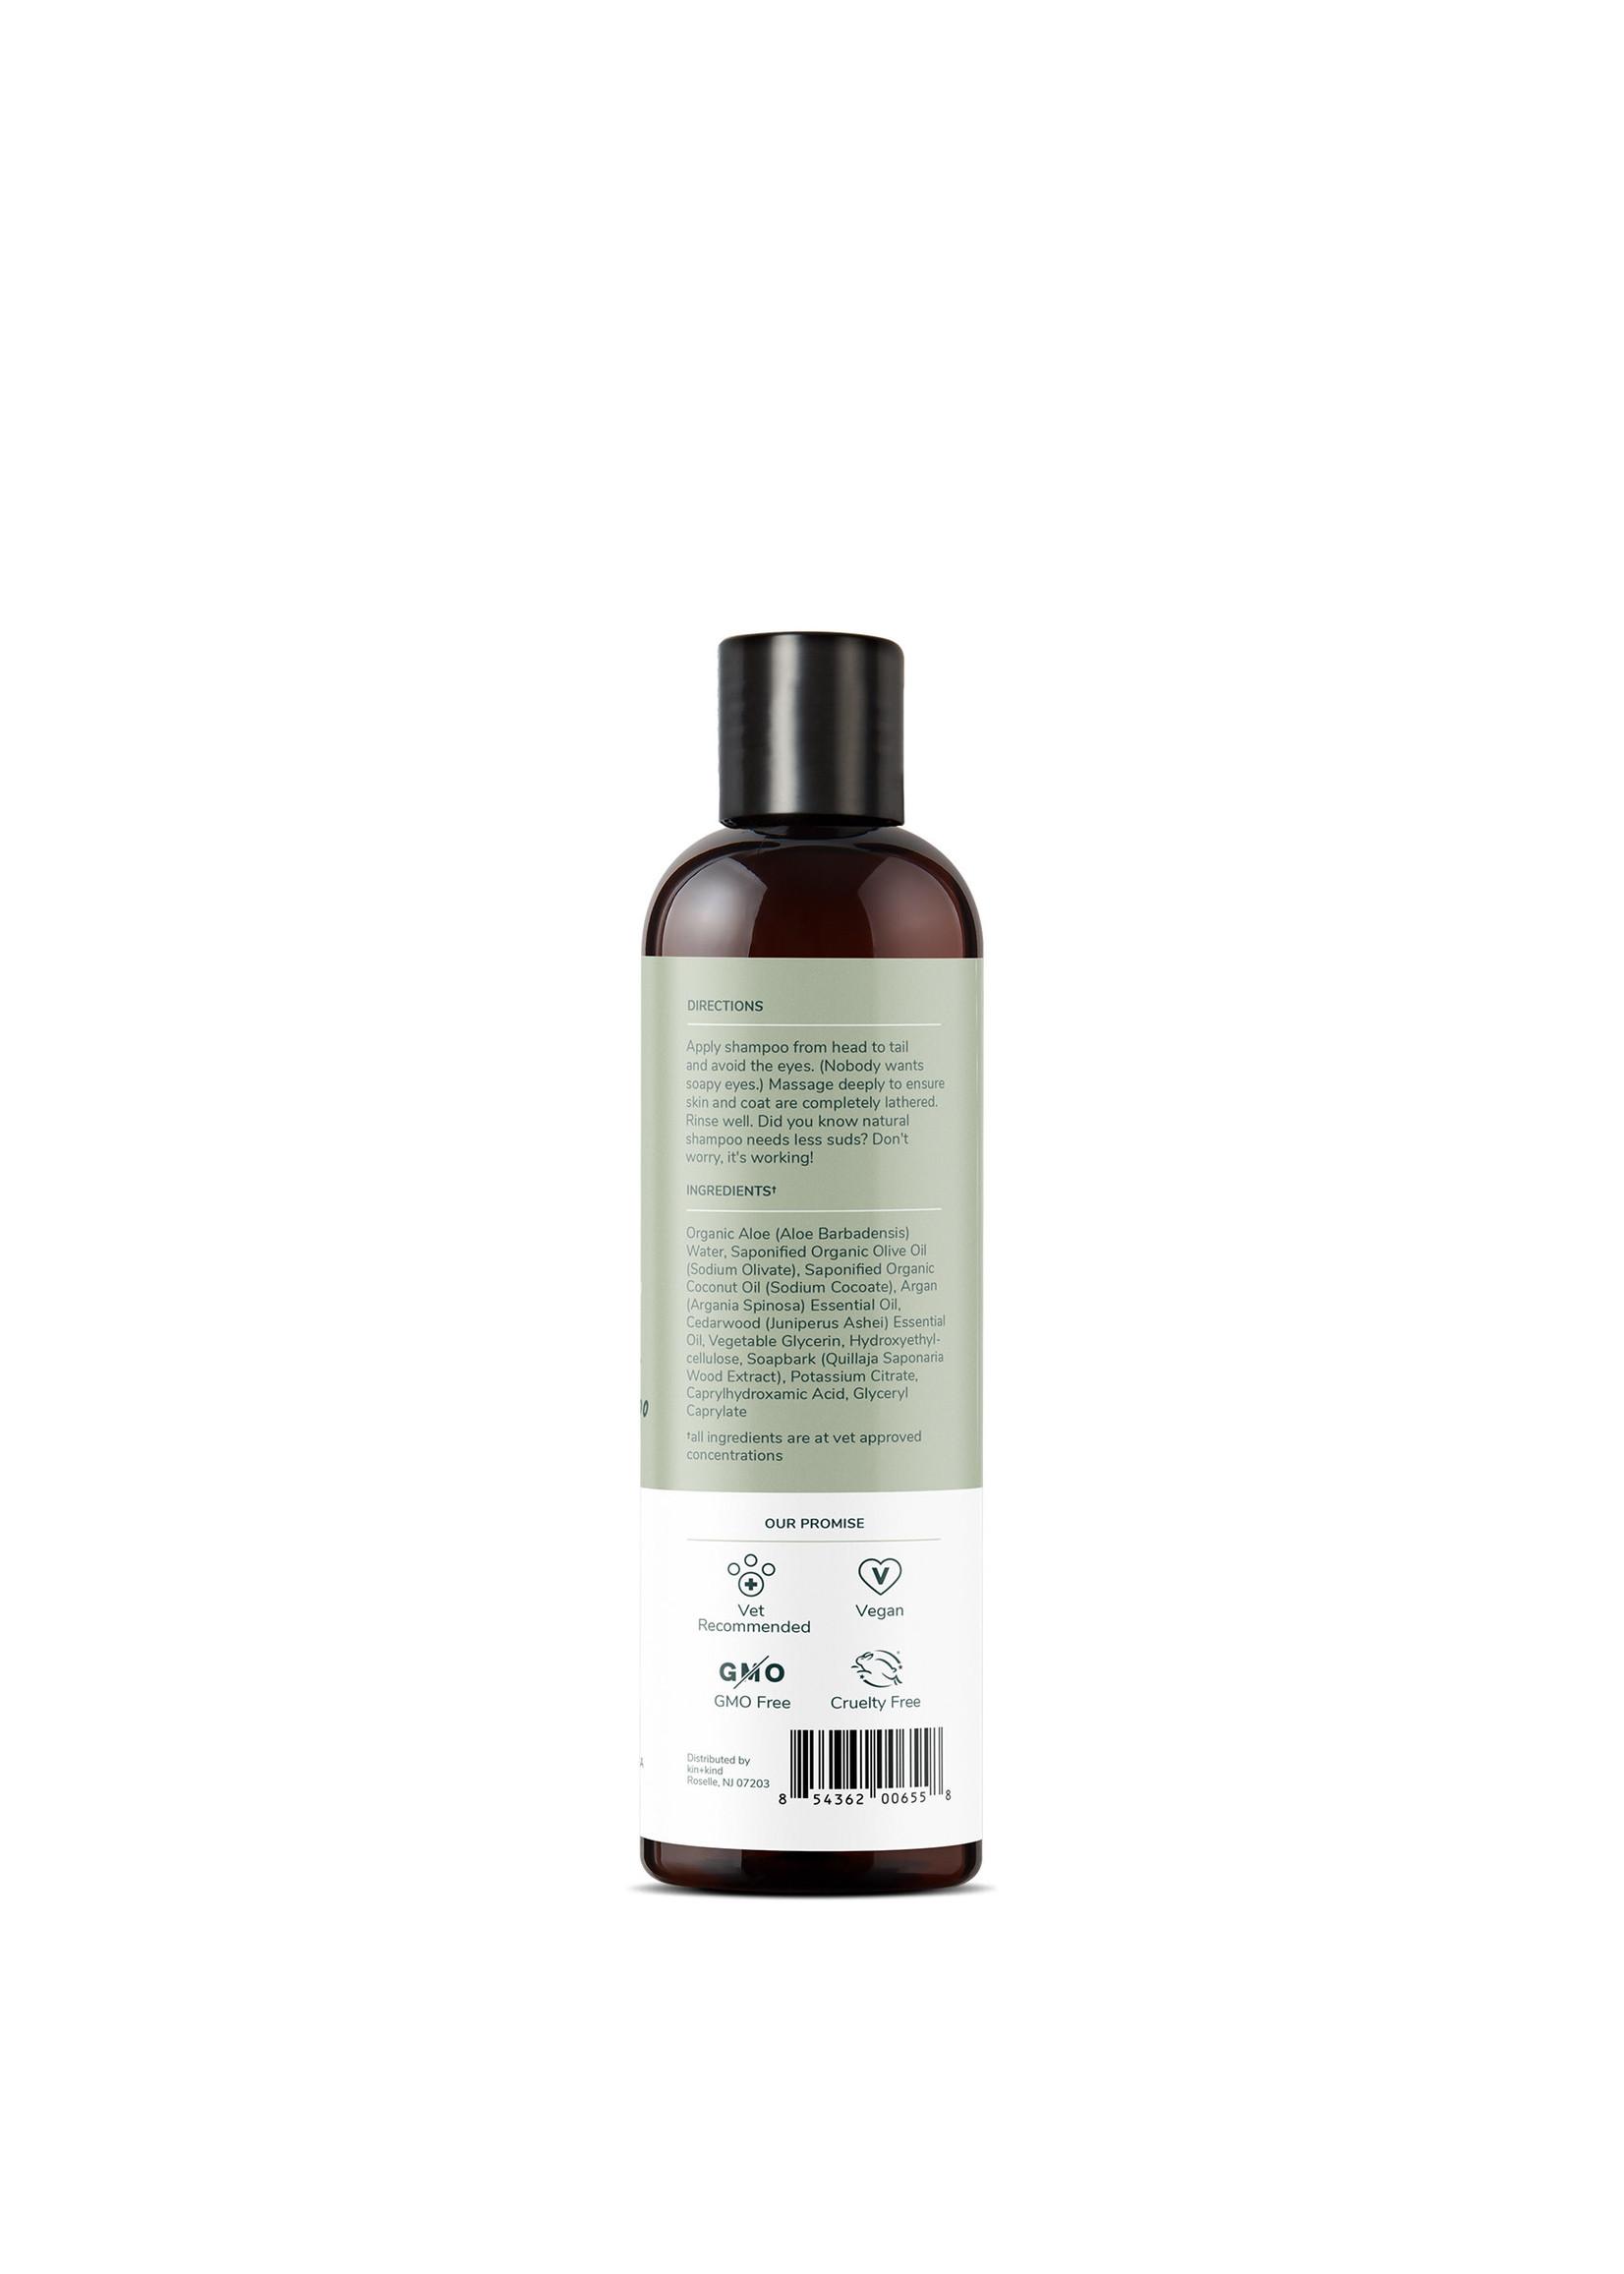 Kin + Kind Kin & Kind Cedar Argan Repair Dry Skin & Coat Shampoo 12 oz